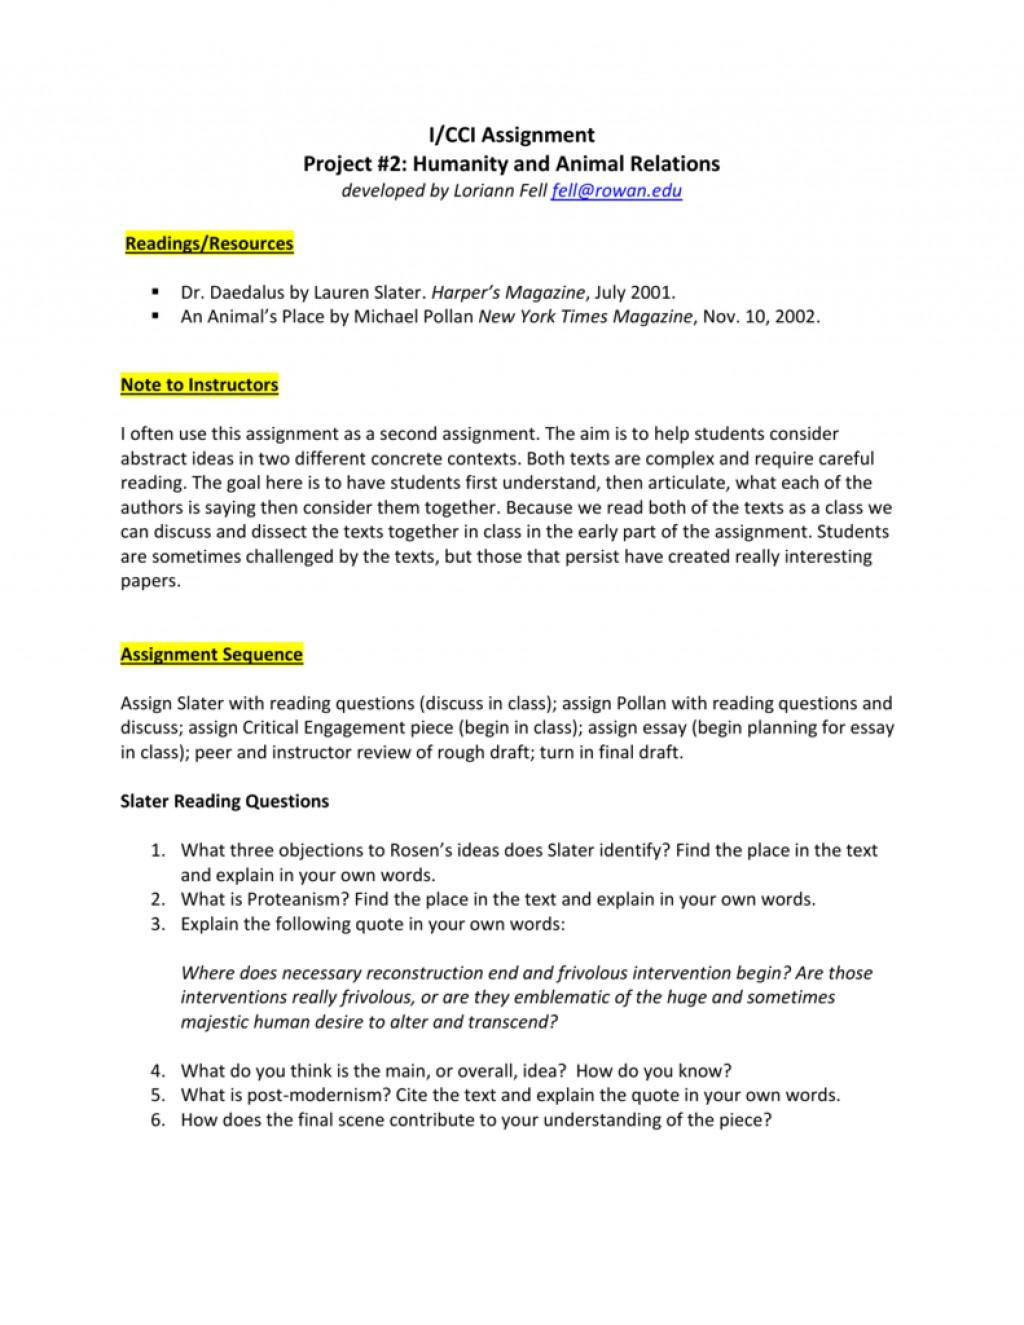 002 007350434 1 Relationship Essay Unbelievable Essays Psychology Causal Topics Love Large